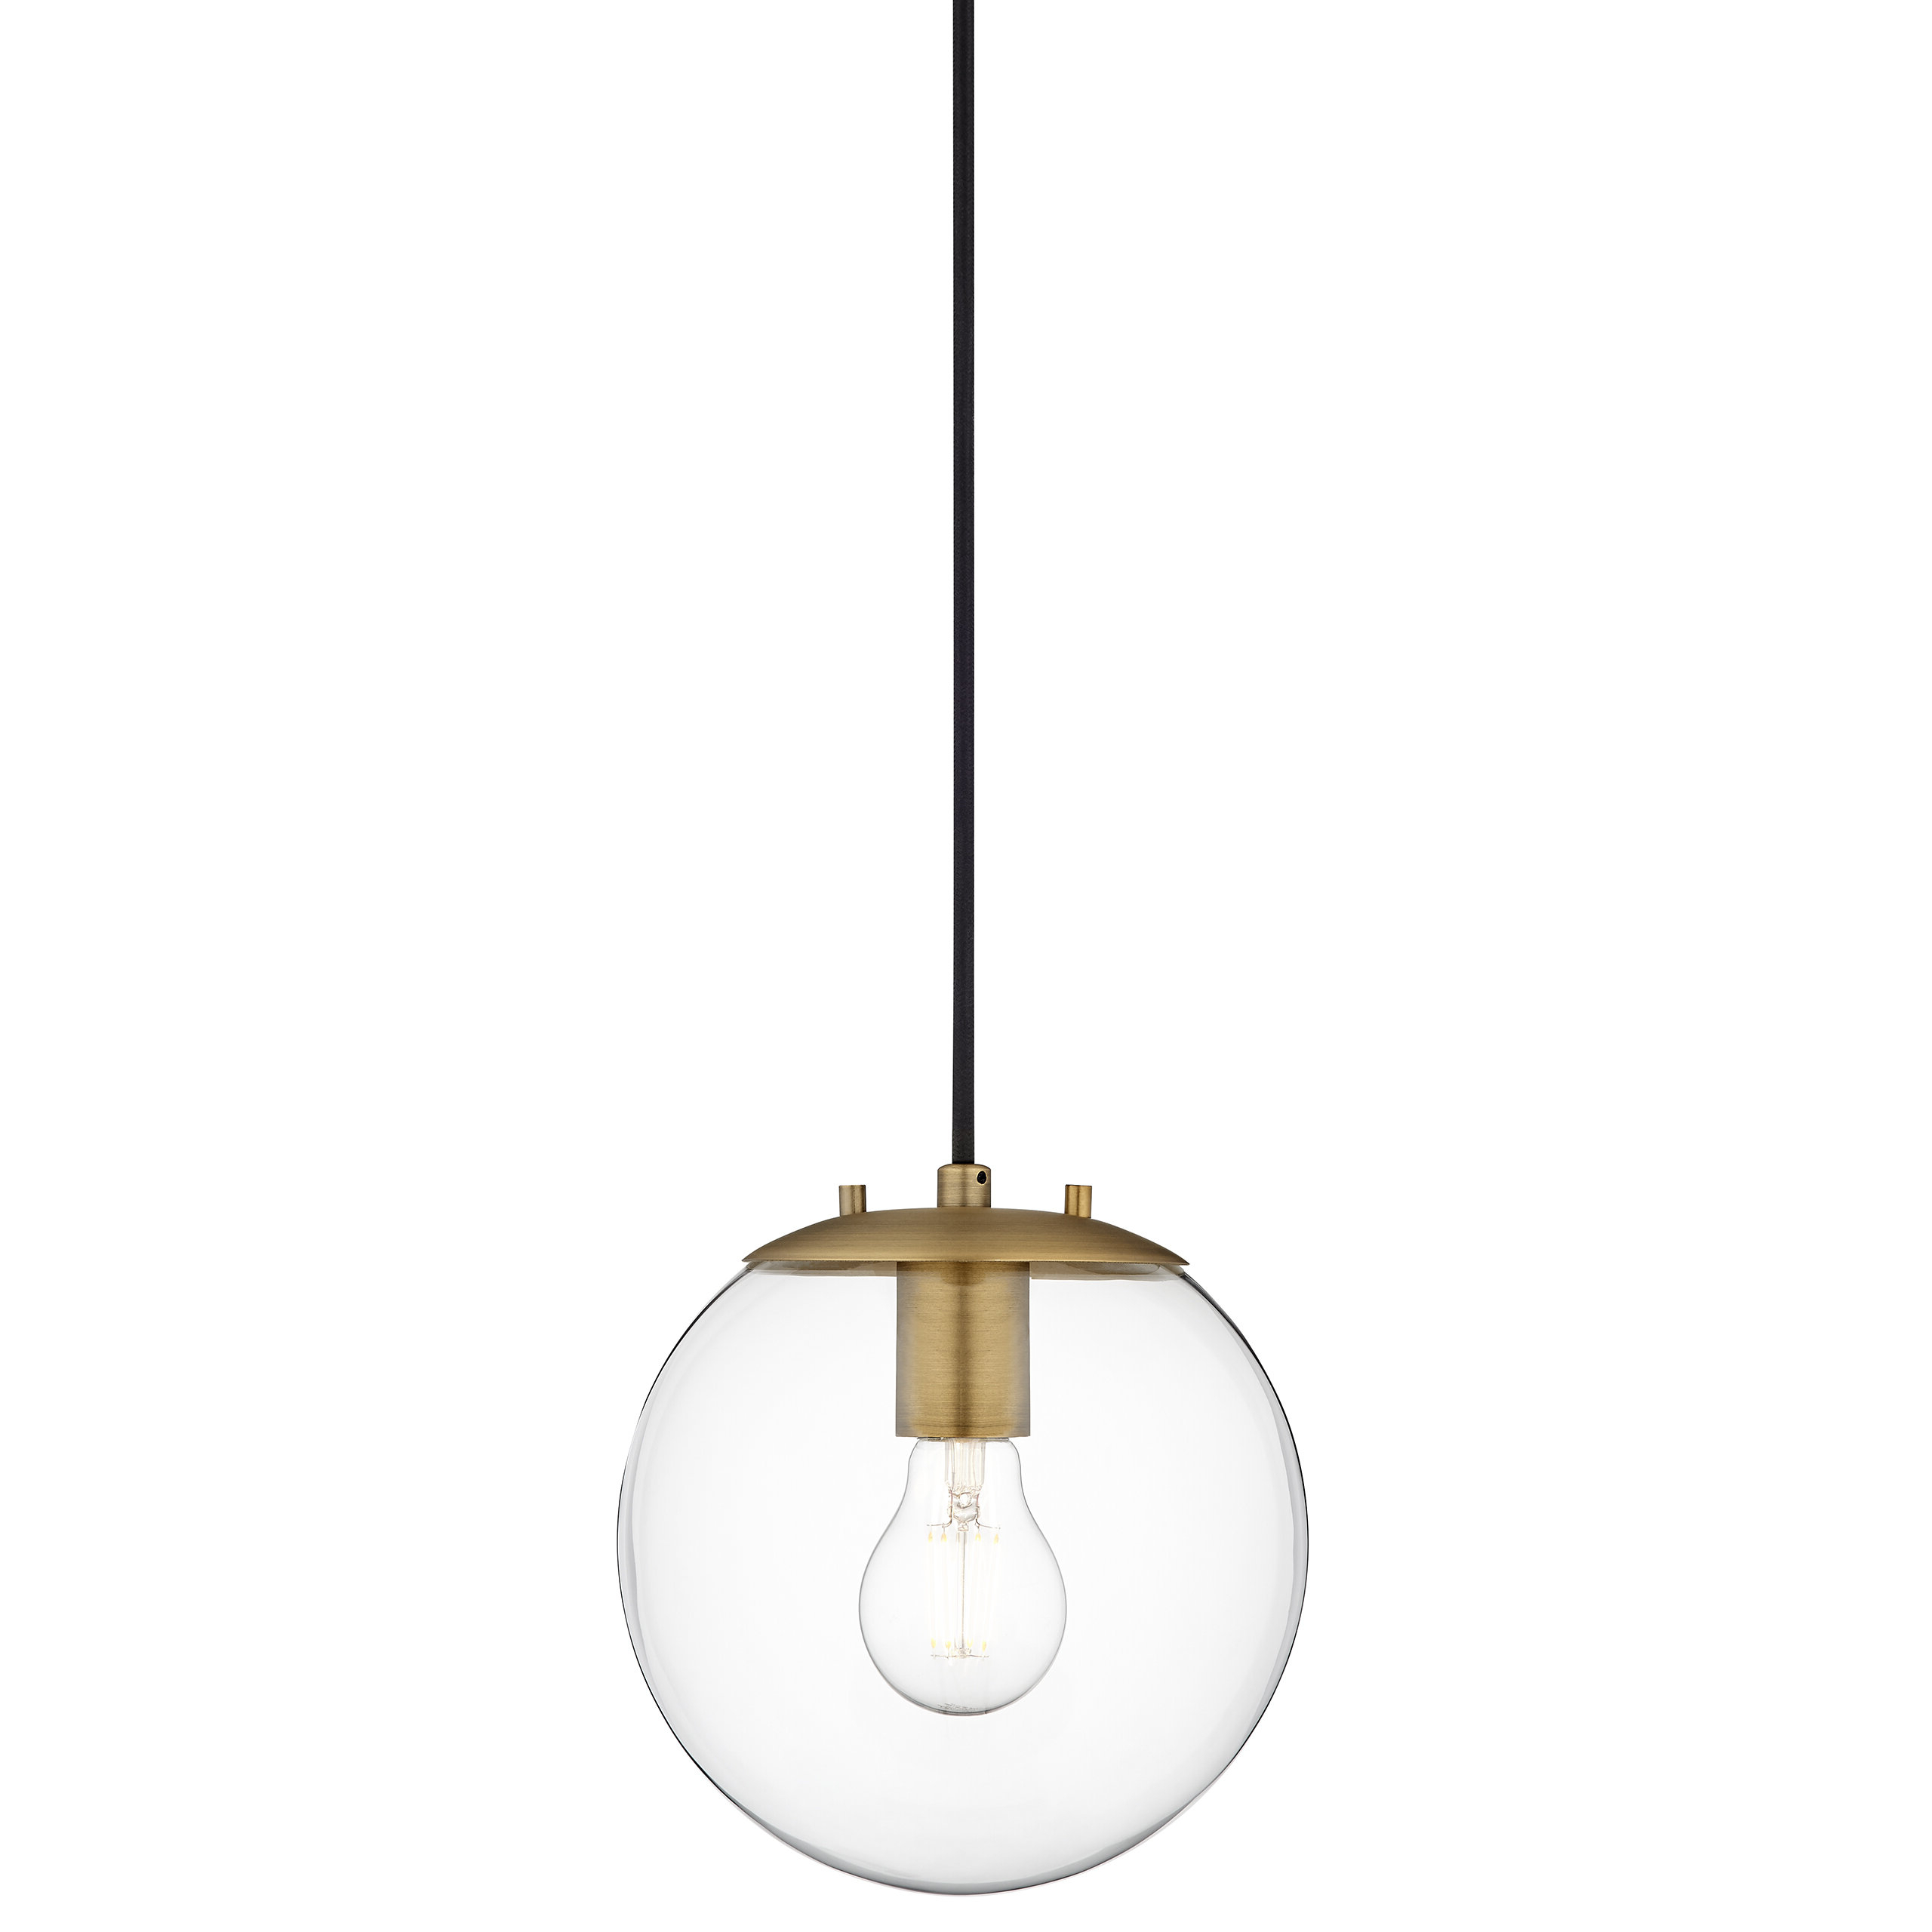 Most Recent Cayden 1 Light Single Globe Pendants Intended For Wysocki 1 Light Single Globe Pendant (View 12 of 25)